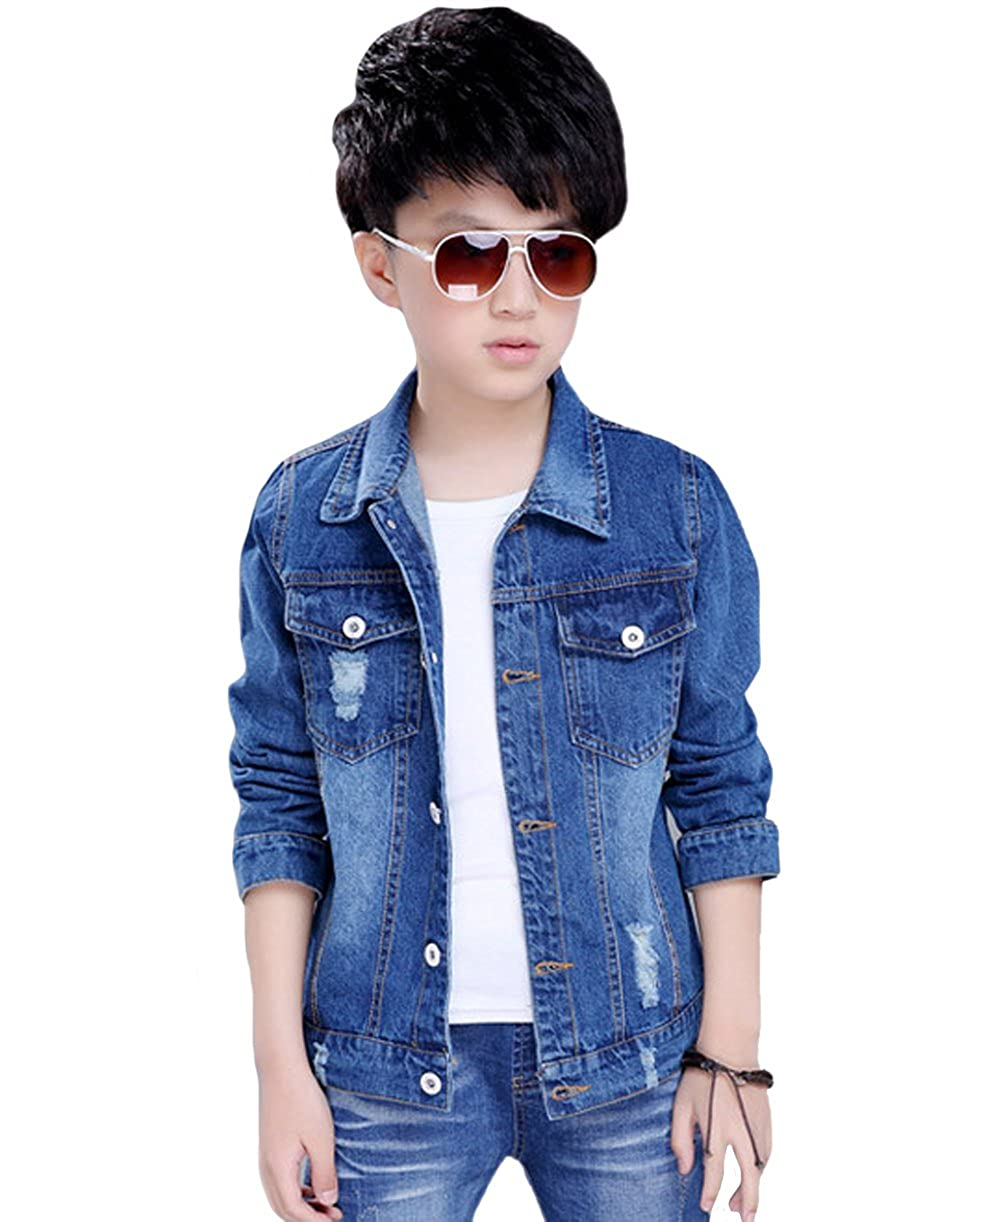 Tortor 1Bacha Kid Boys Distressed Long Sleeve Denim Jacket